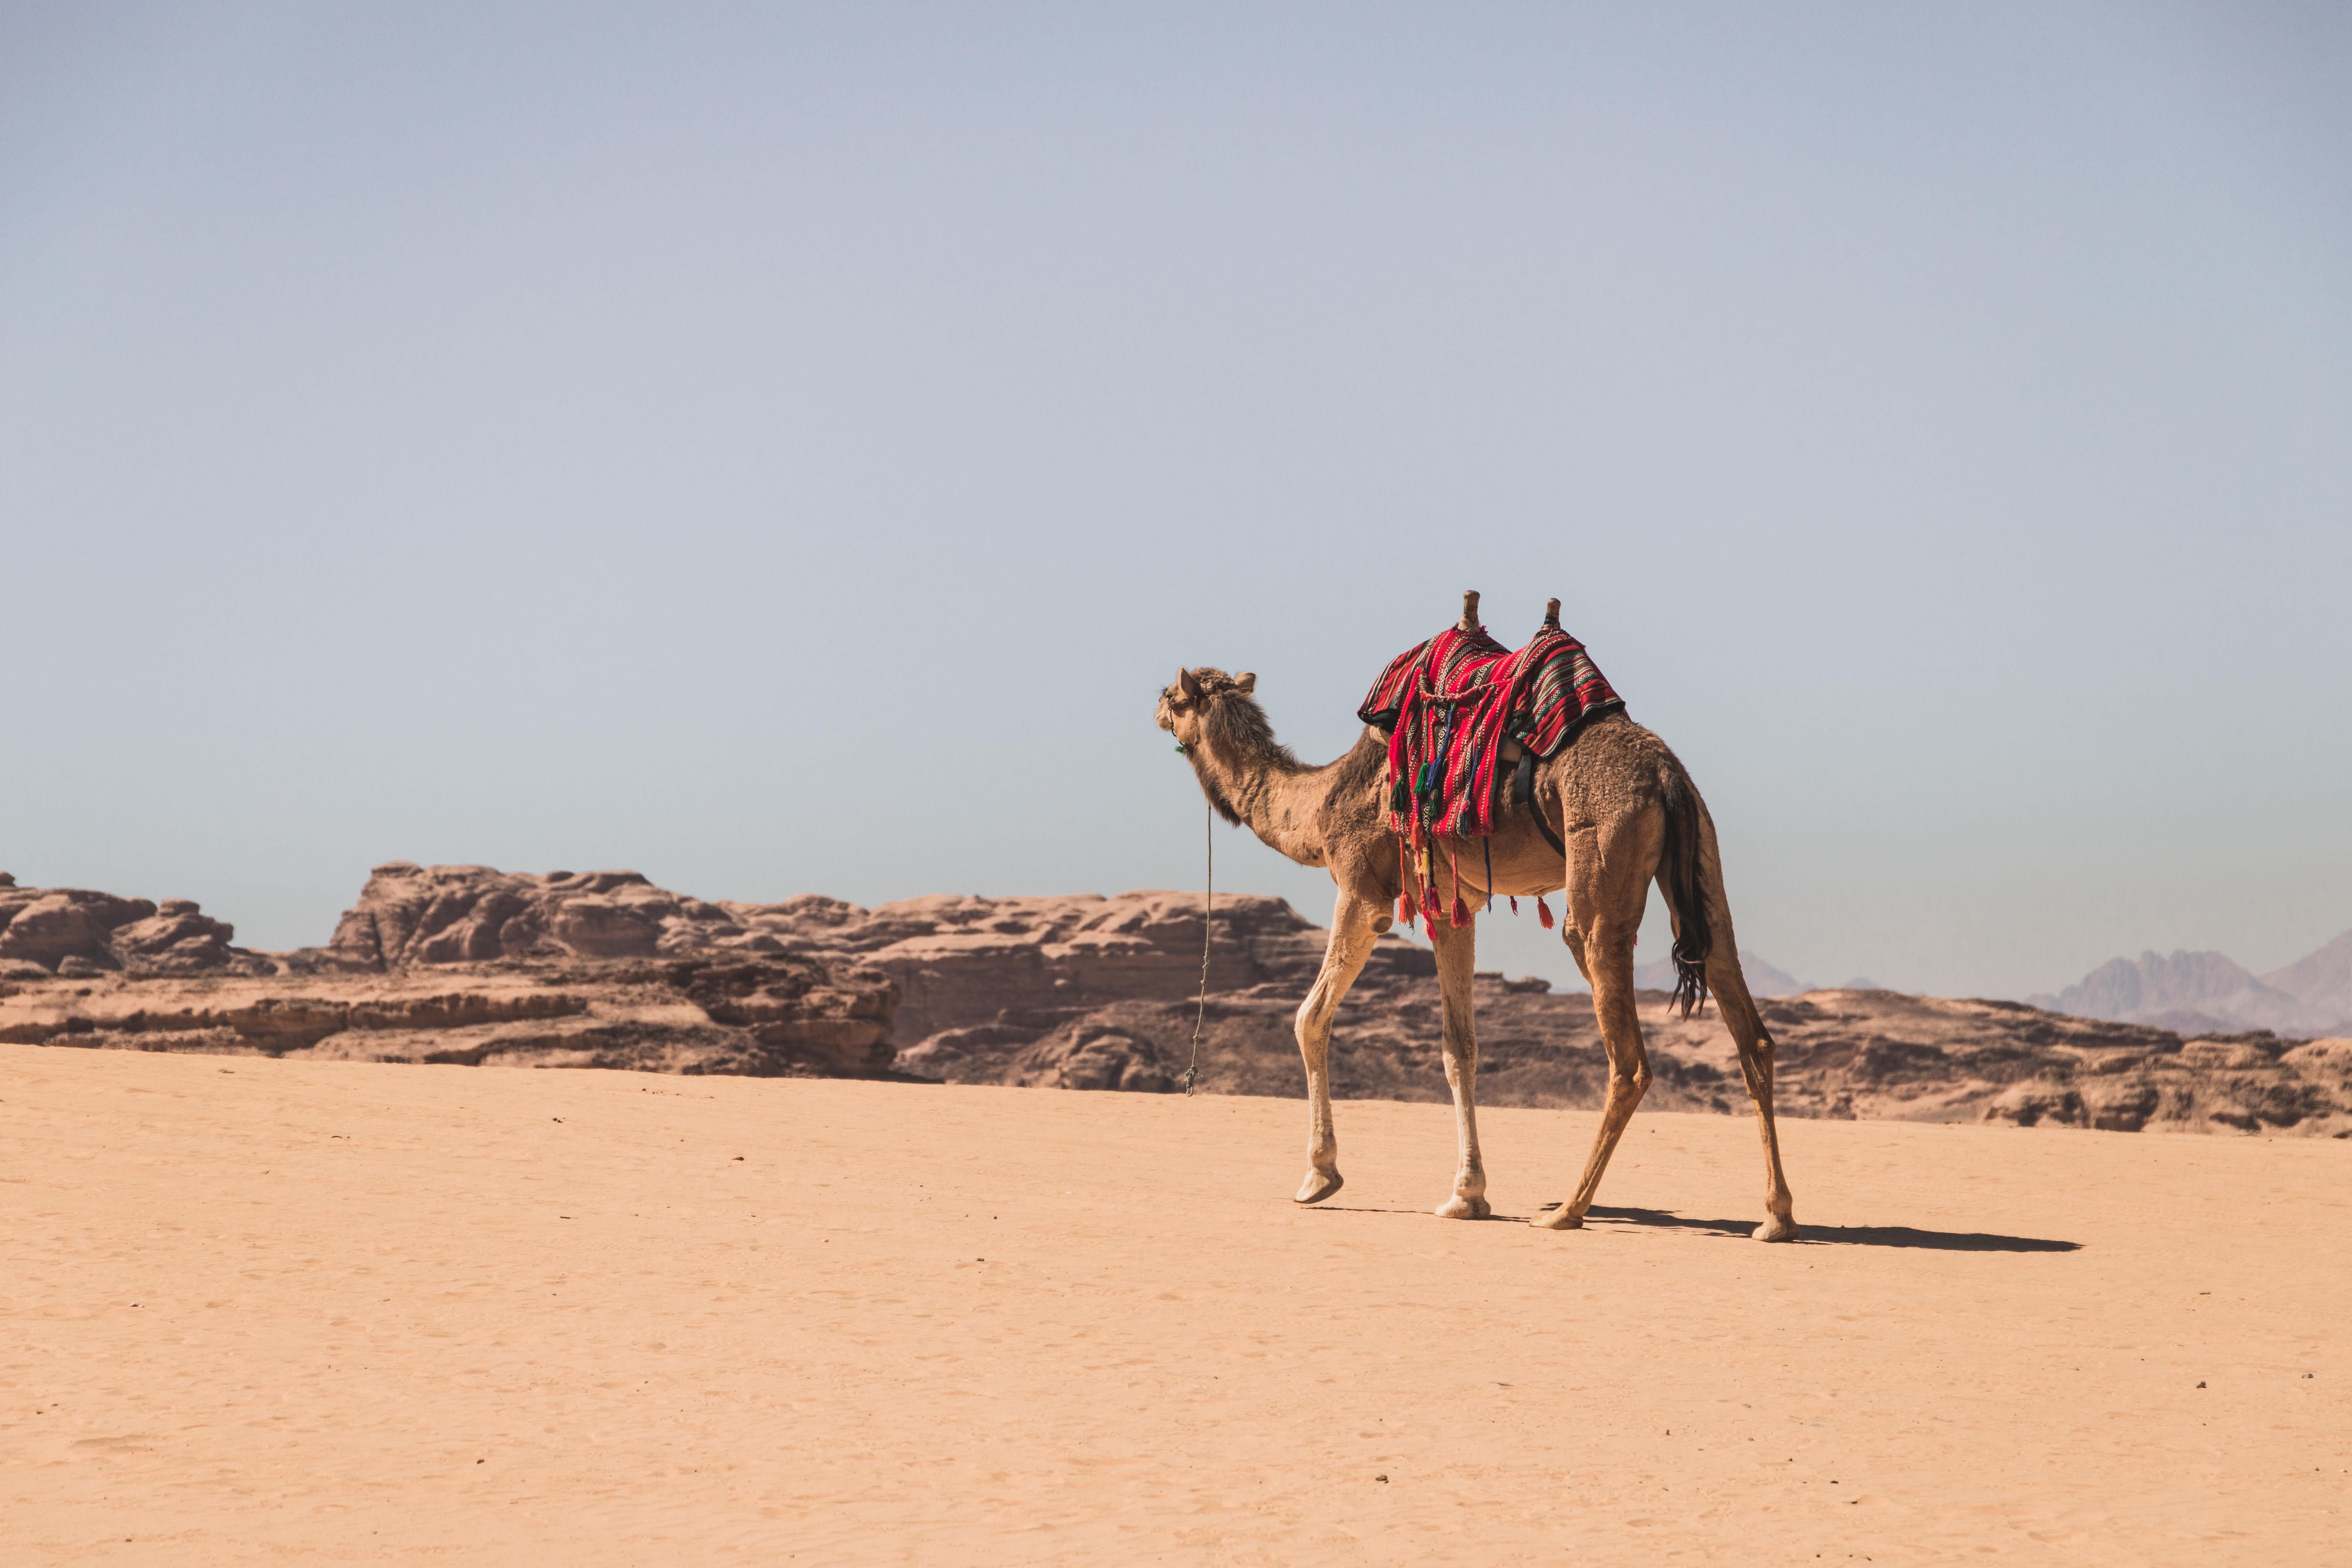 Jordanie | 2 jours & 2 nuits à Wadi Rum